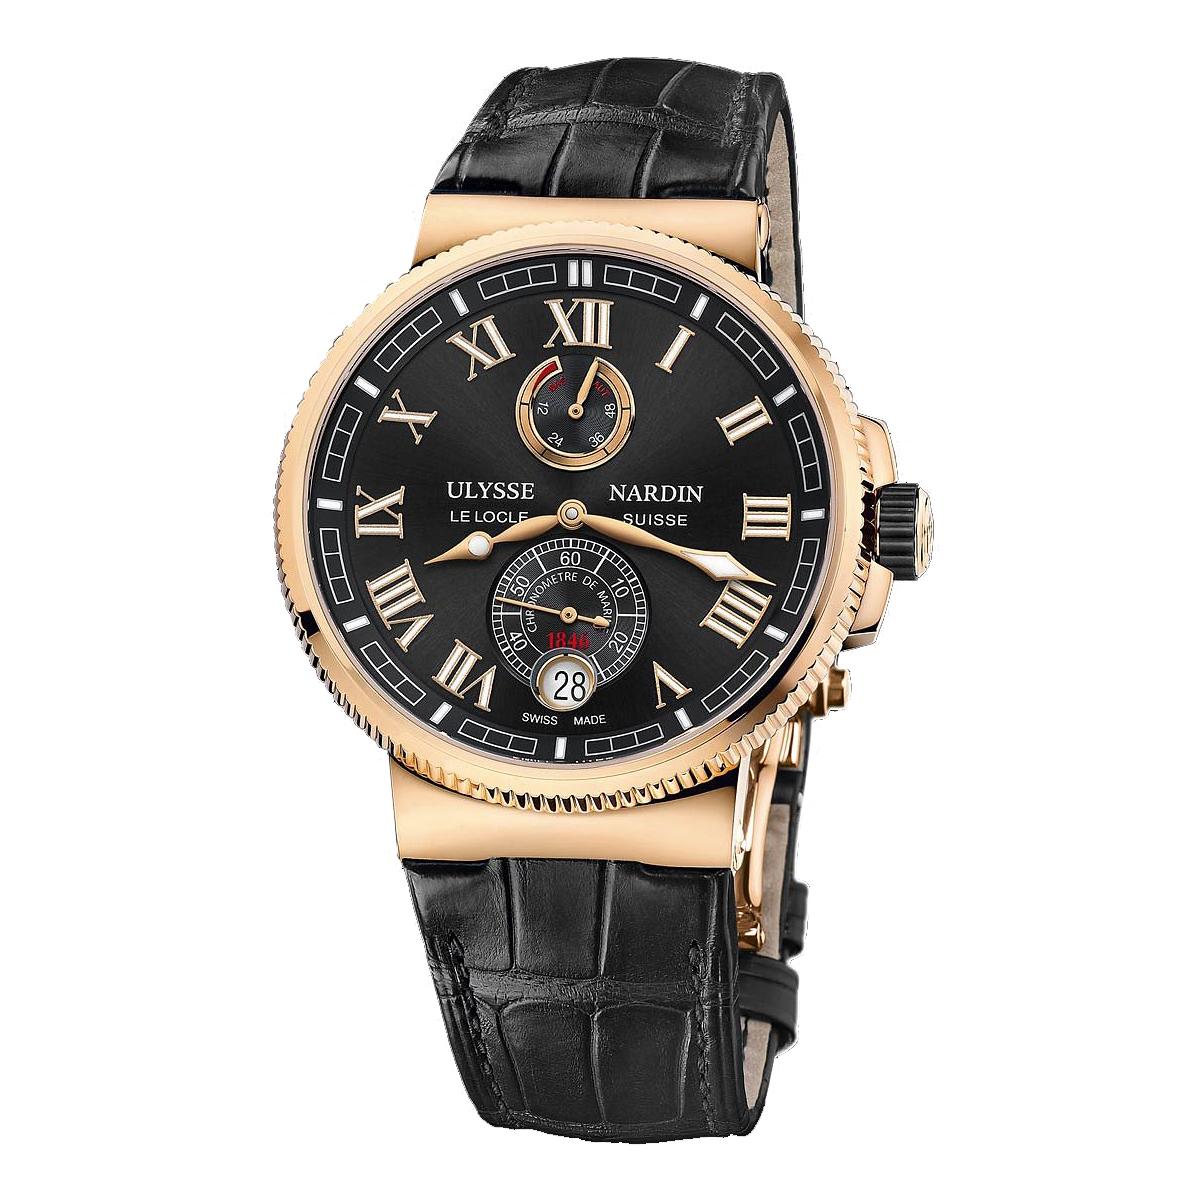 Marine Chronometer Manufacture 43mm 1186-126/42